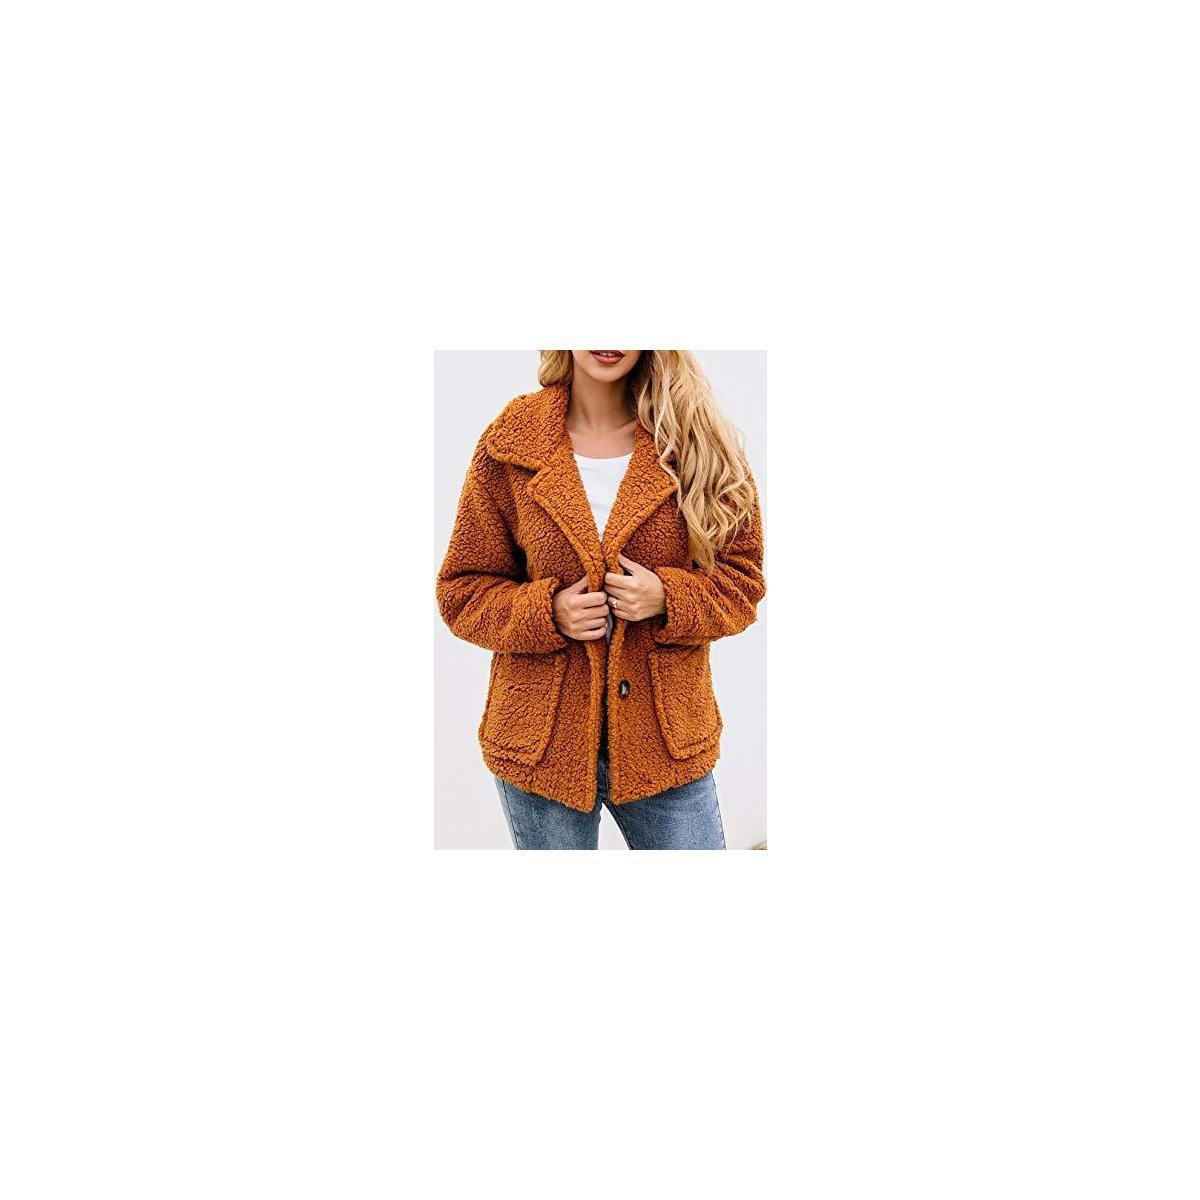 Women's Coat Casual Lapel Fleece Fuzzy Cozy Fit Cardigans Shearling Button Winter Coat Jackets with Pockets